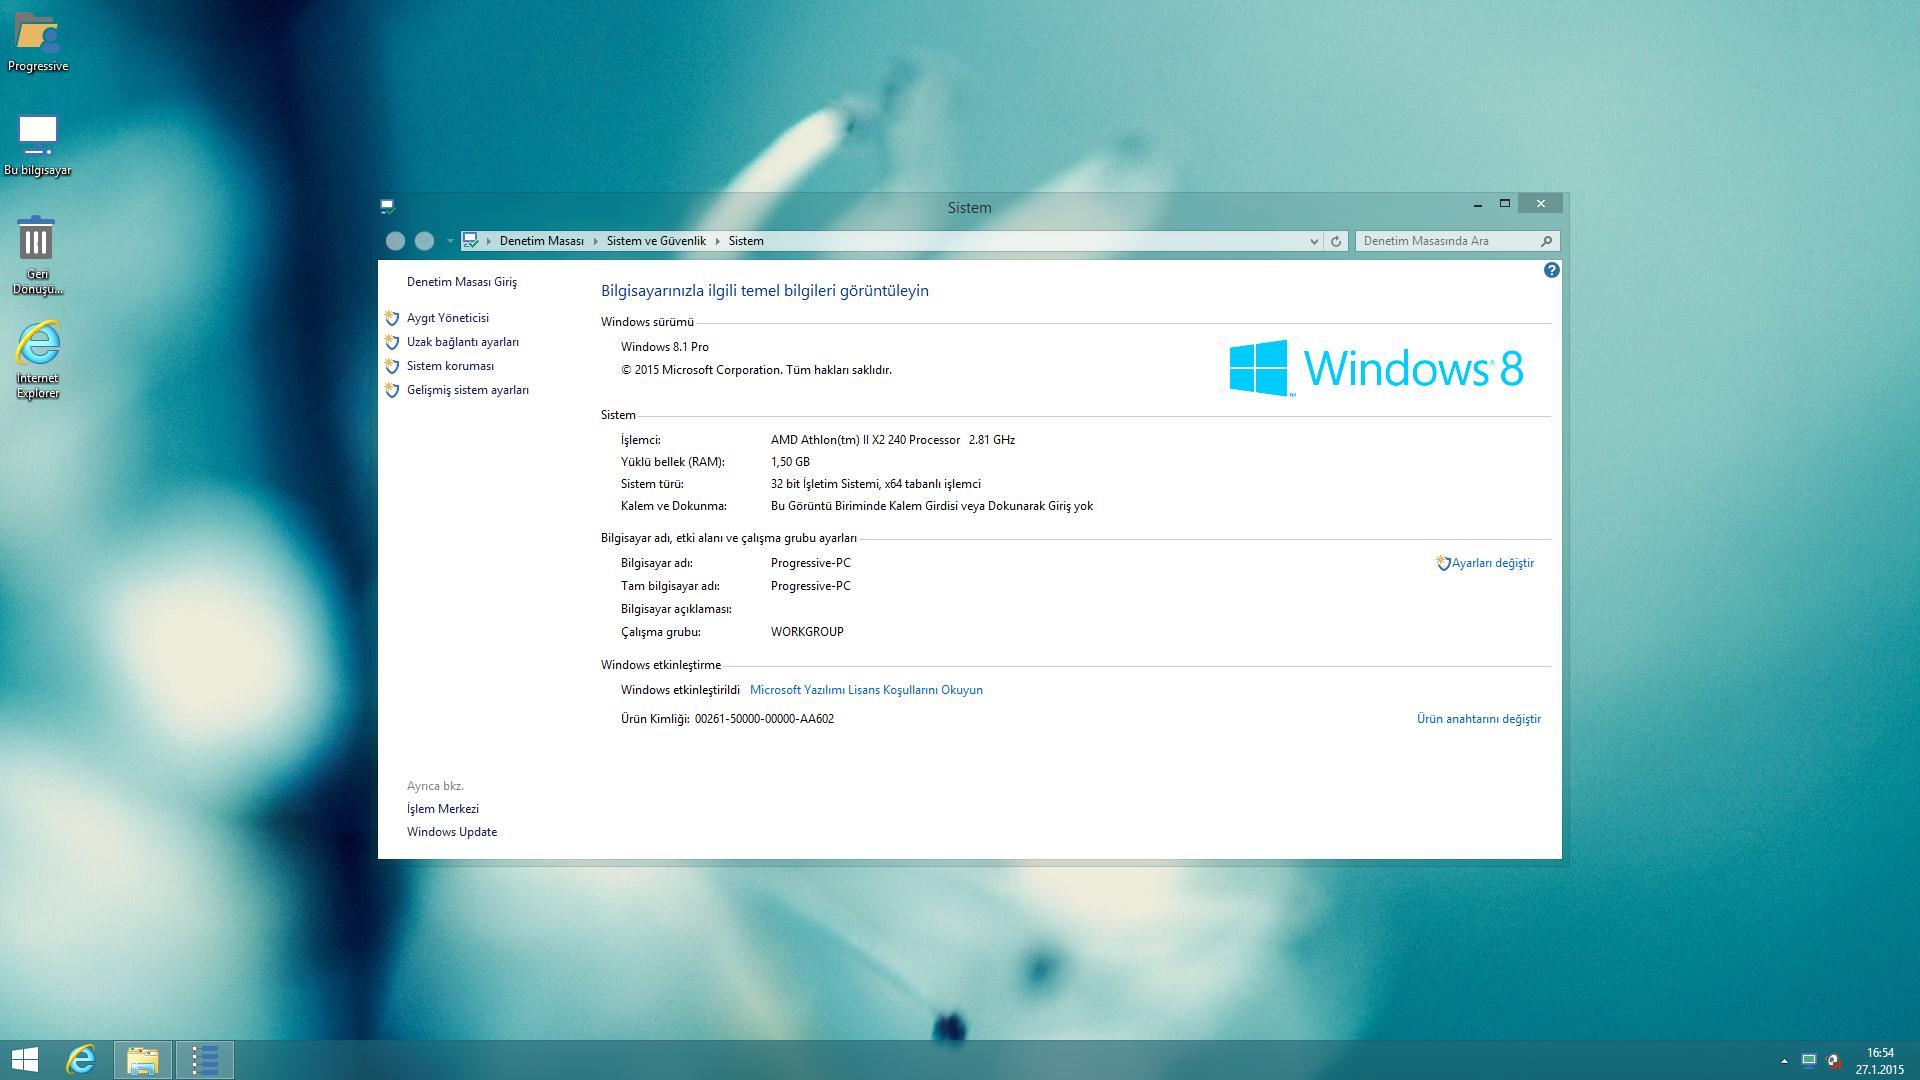 Windows 8 professional coupon